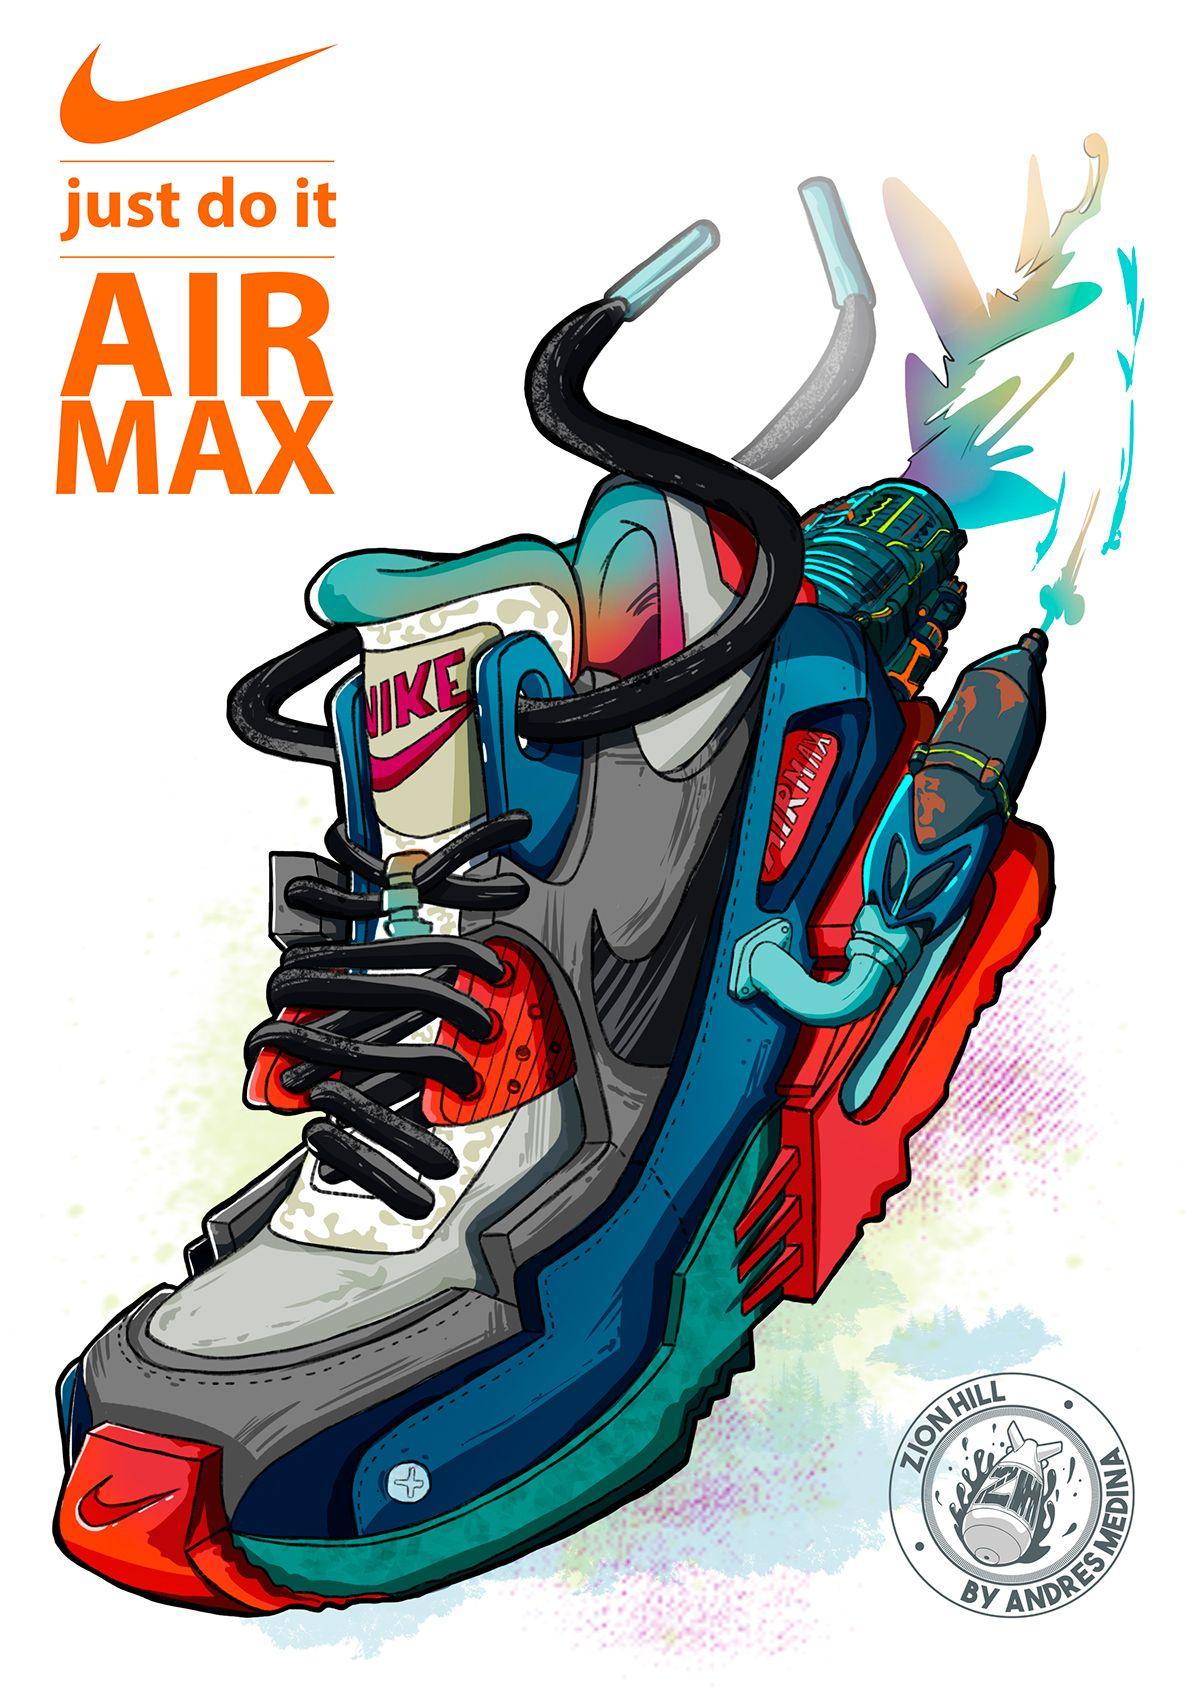 Nike Airmax On Behance スニーカー ストリートアート イラスト